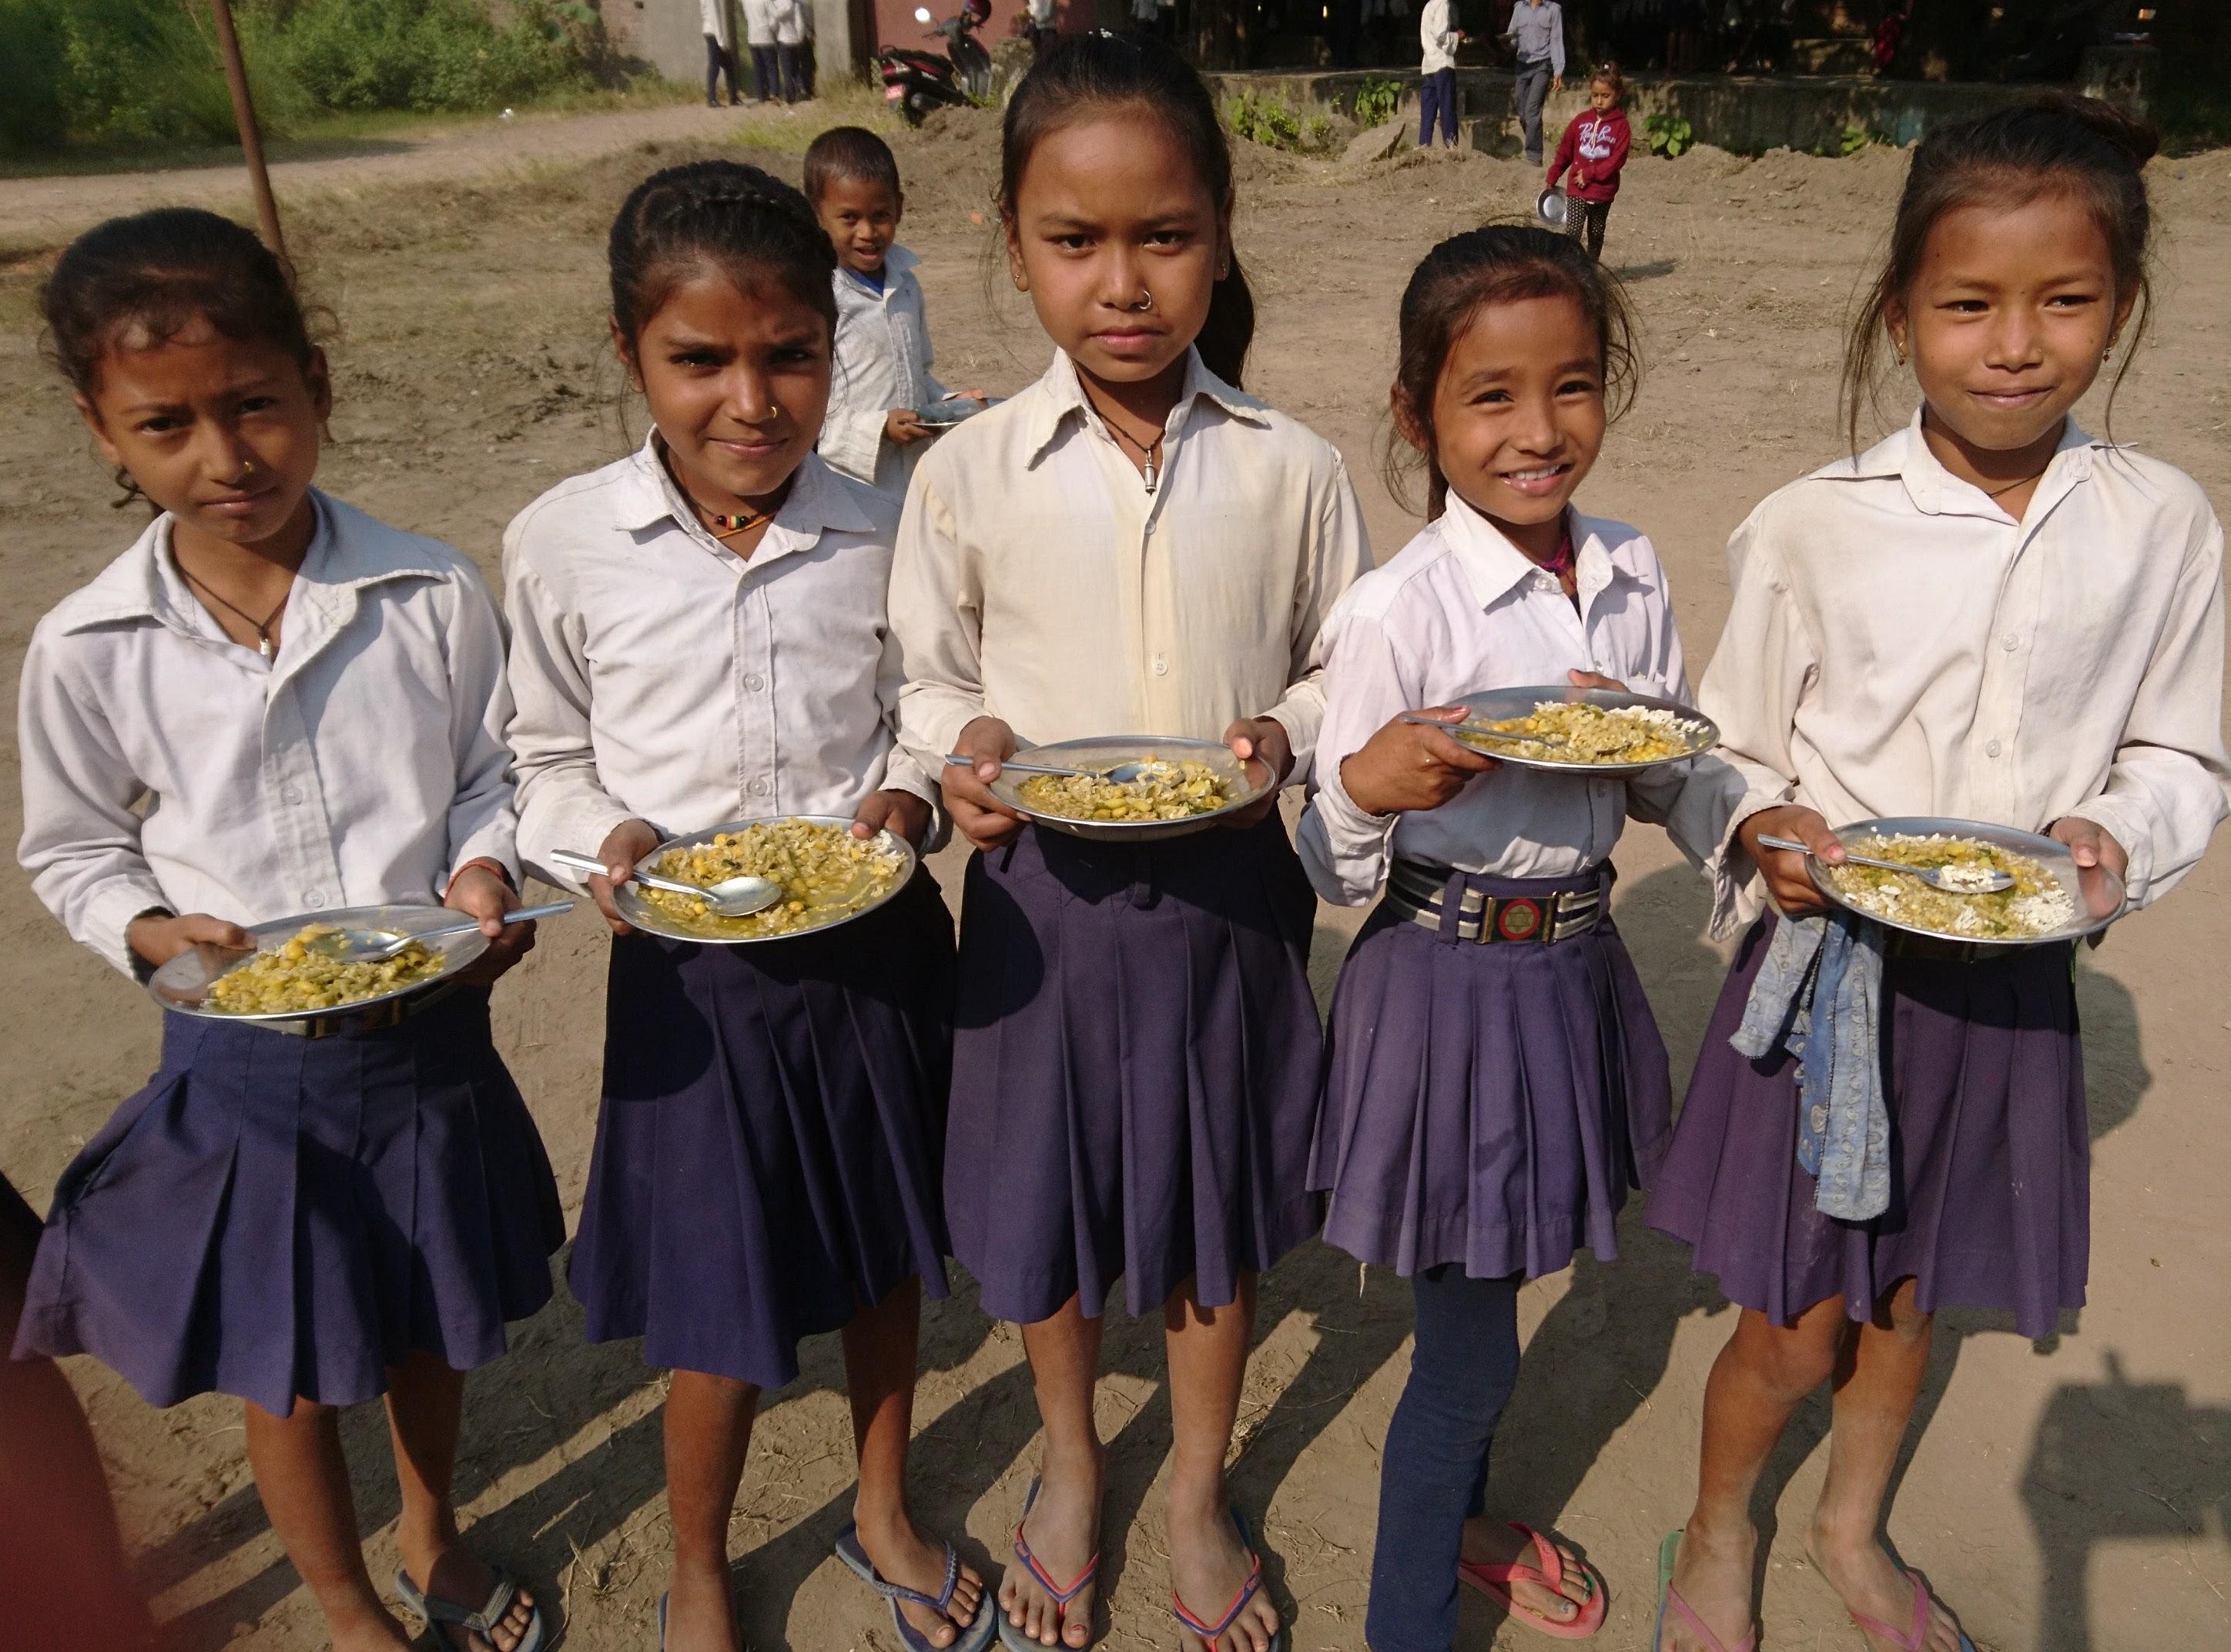 bhawanischool-pigerspiser.jpg